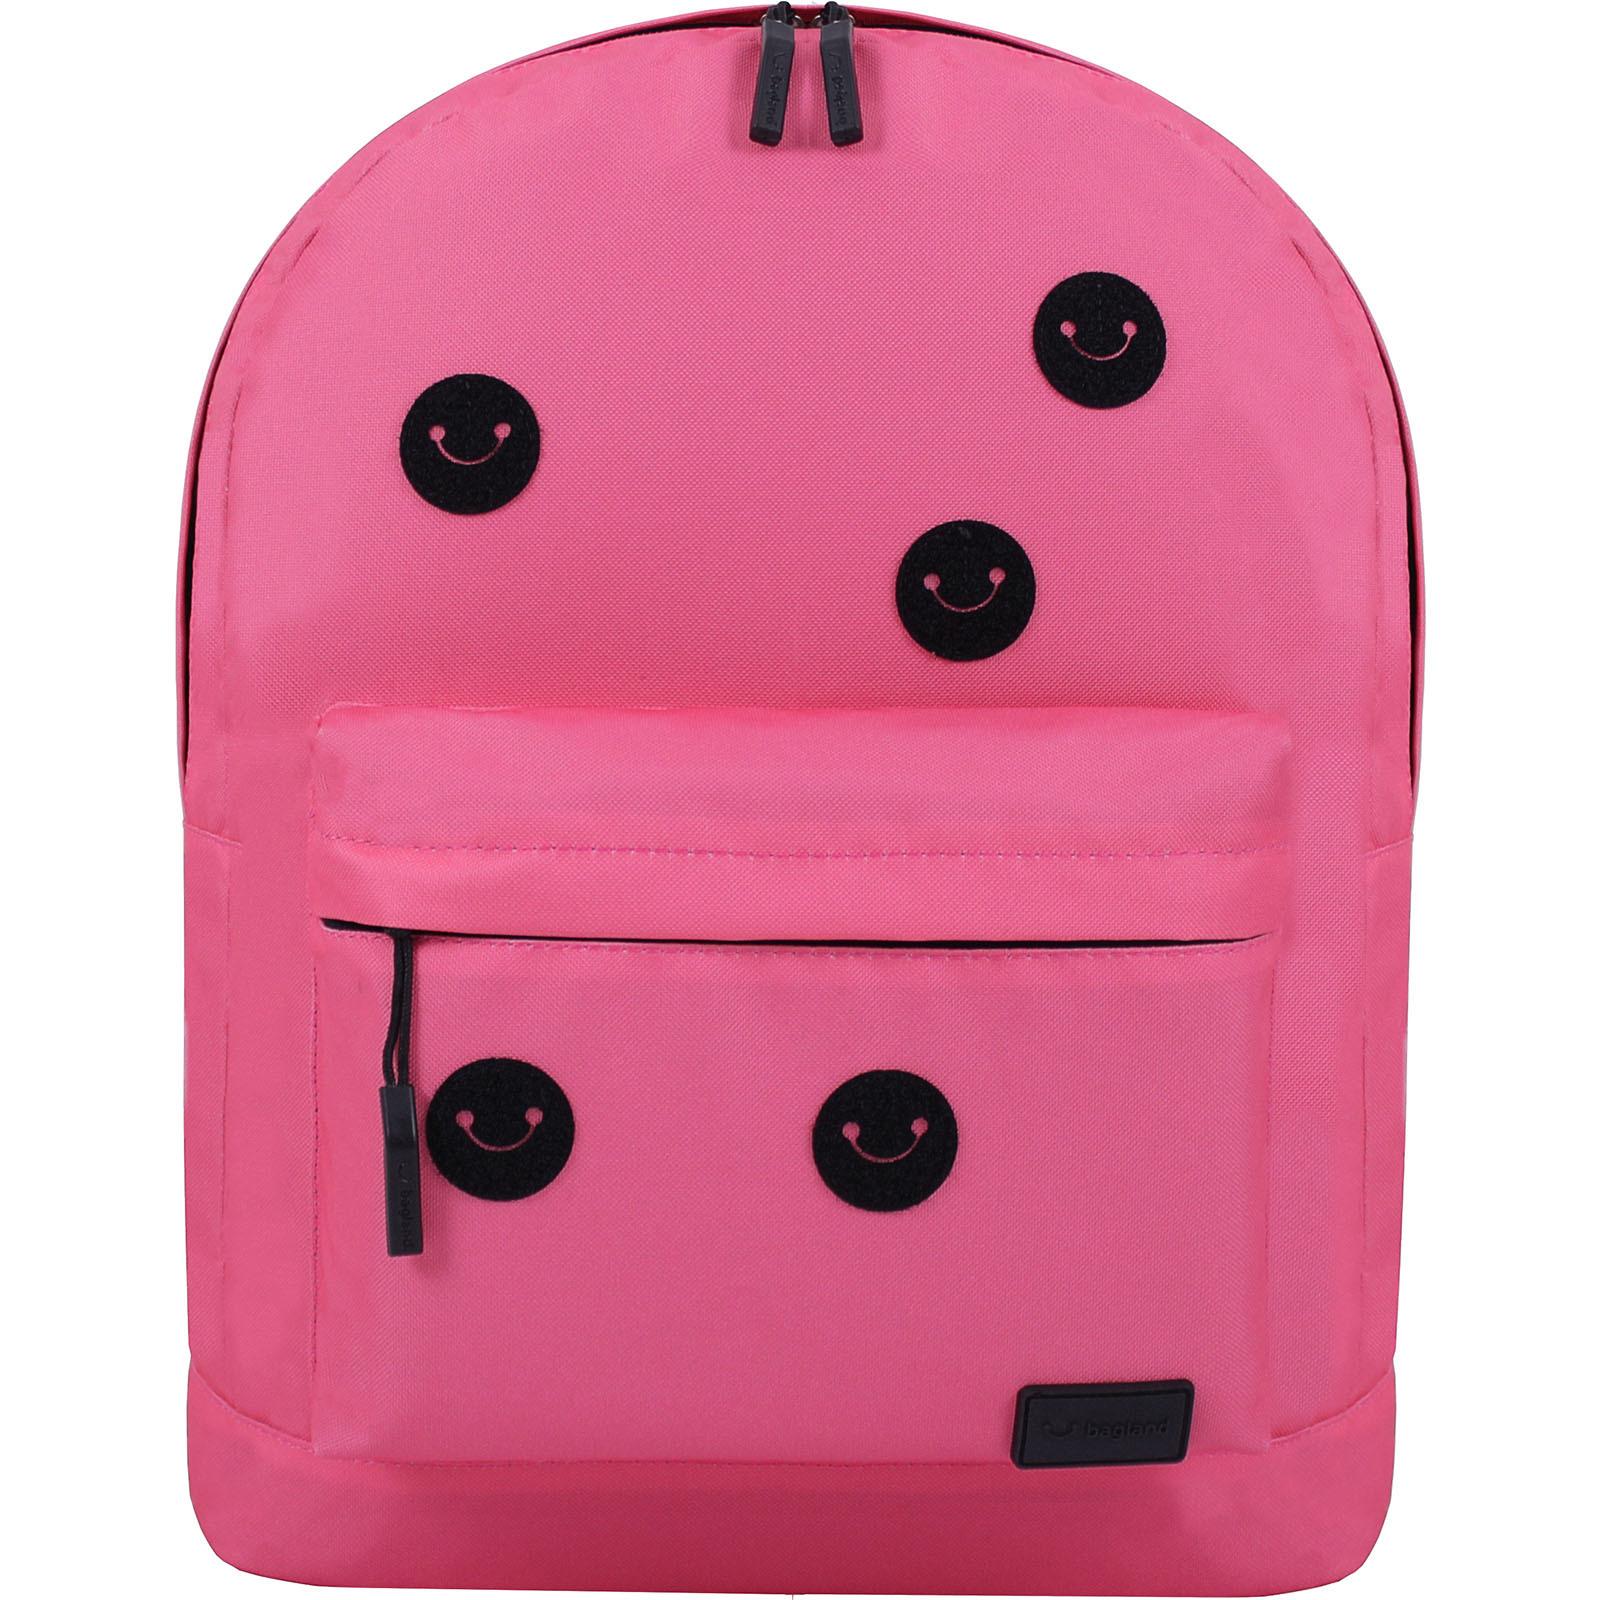 Рюкзак Bagland Молодежный W/R 17 л. Розовый (00533664 Ш) фото 5